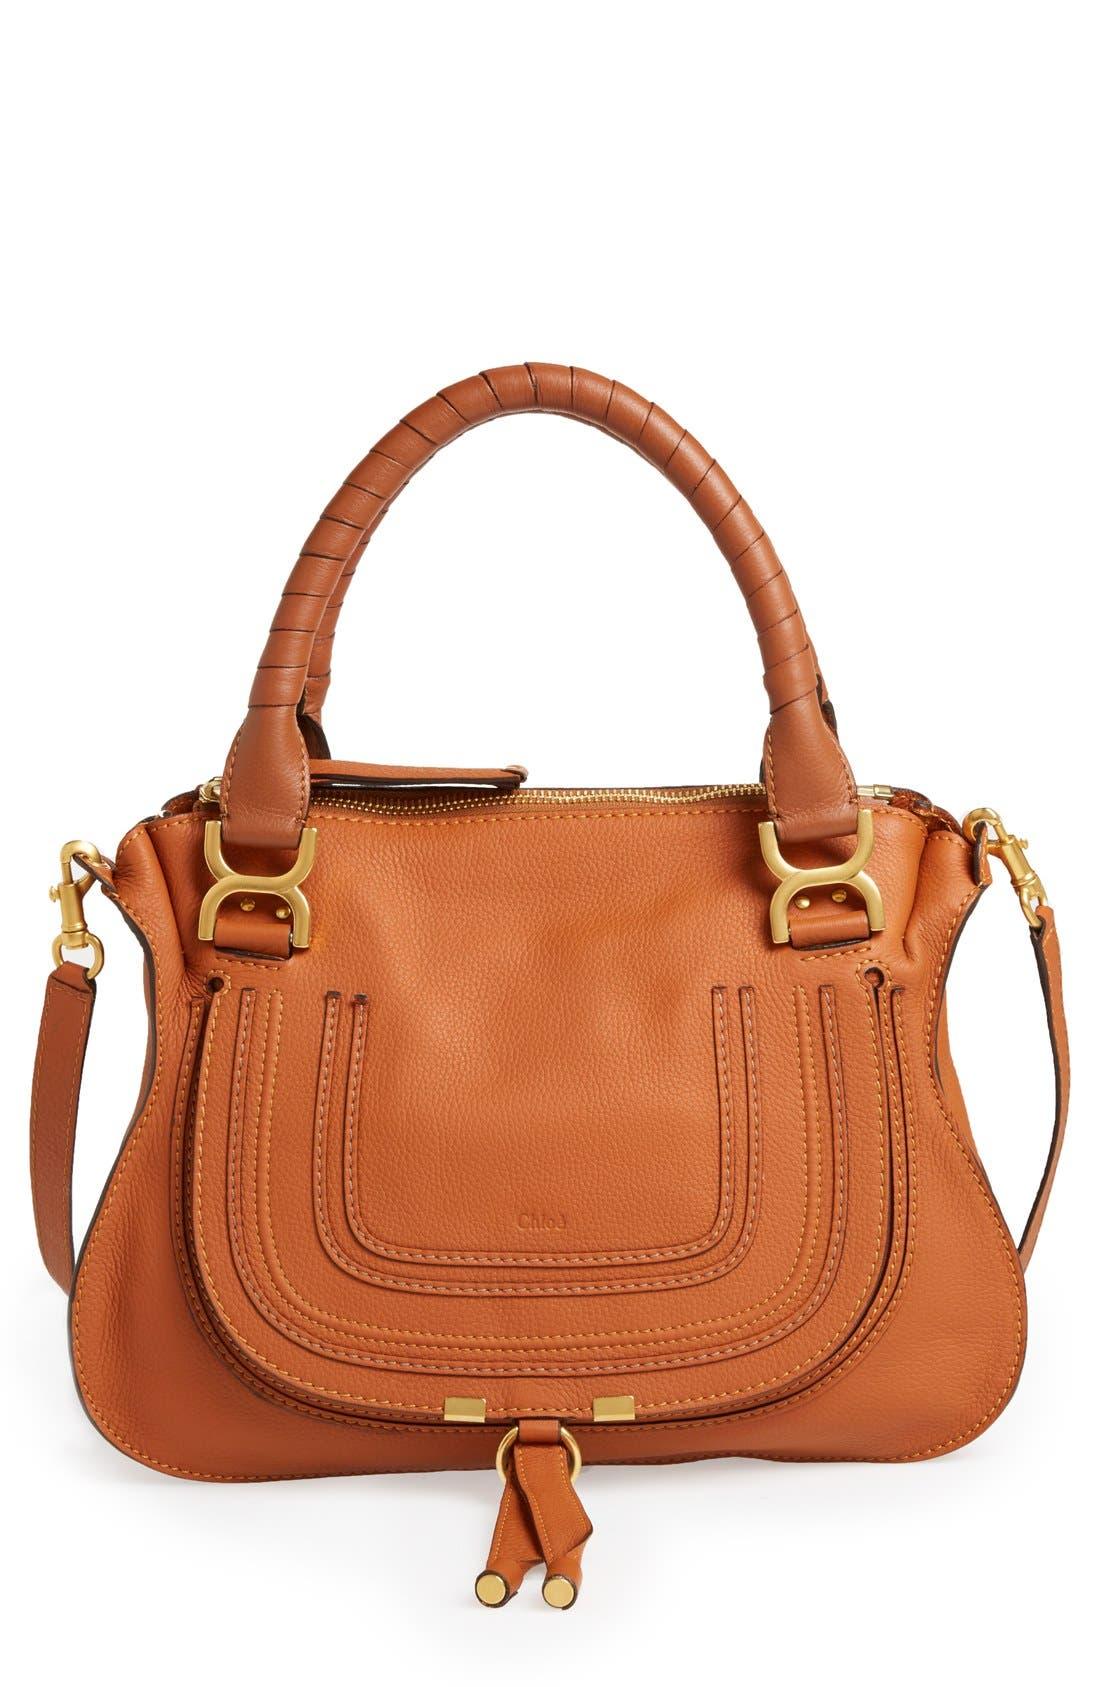 Alternate Image 1 Selected - Chloé 'Medium Marcie' Leather Satchel